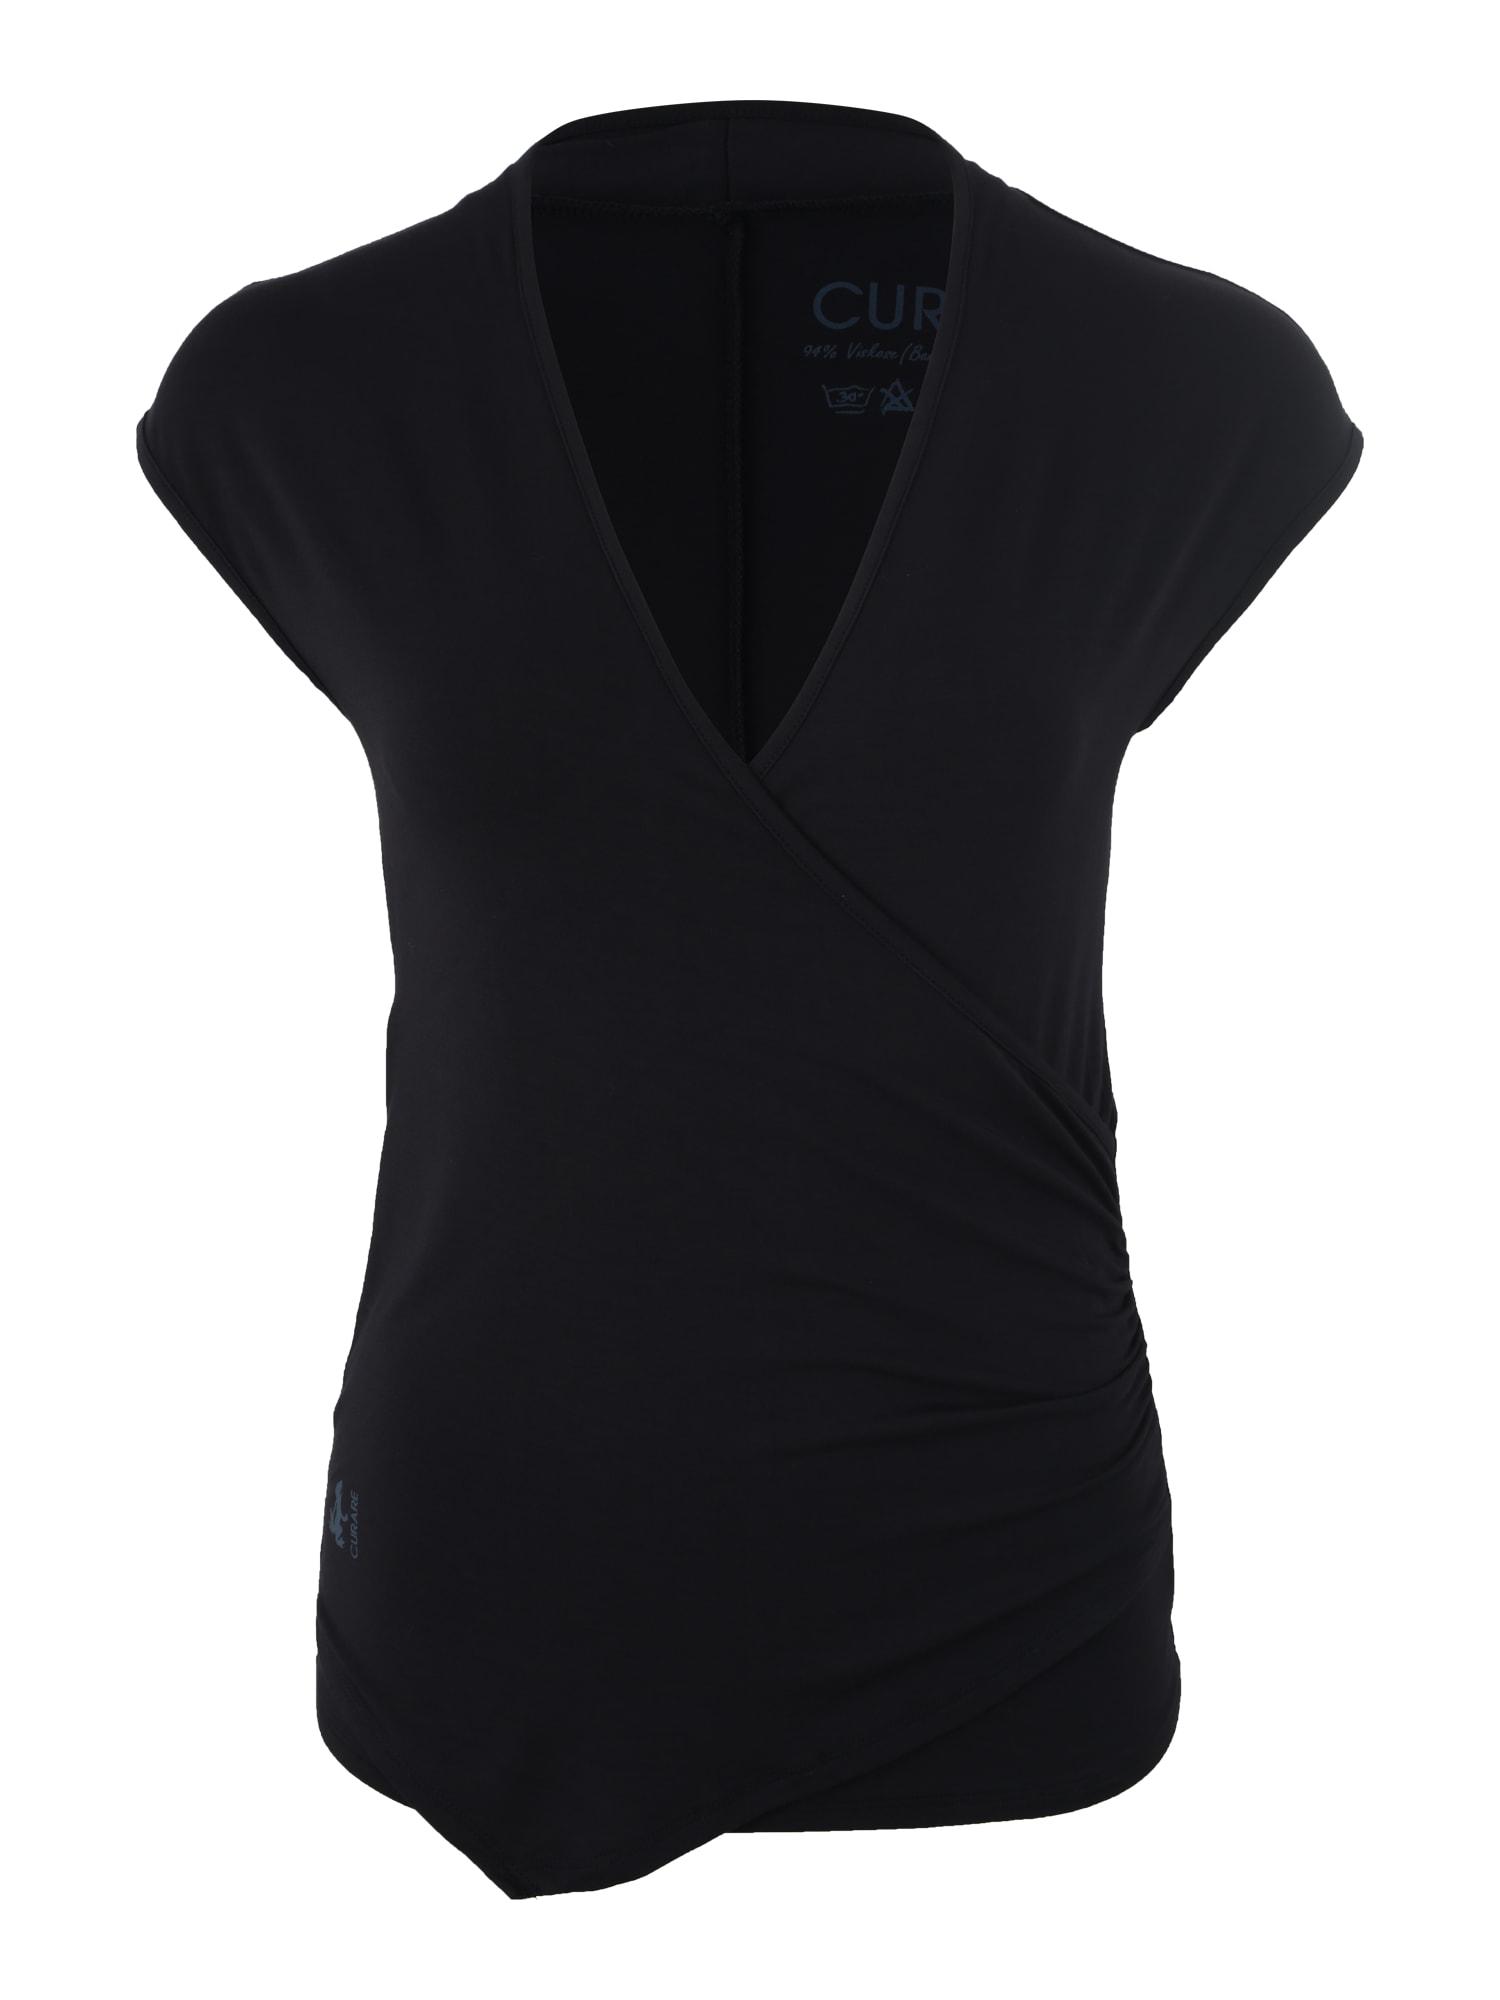 Sportovní top Wickeltop tmavě modrá CURARE Yogawear